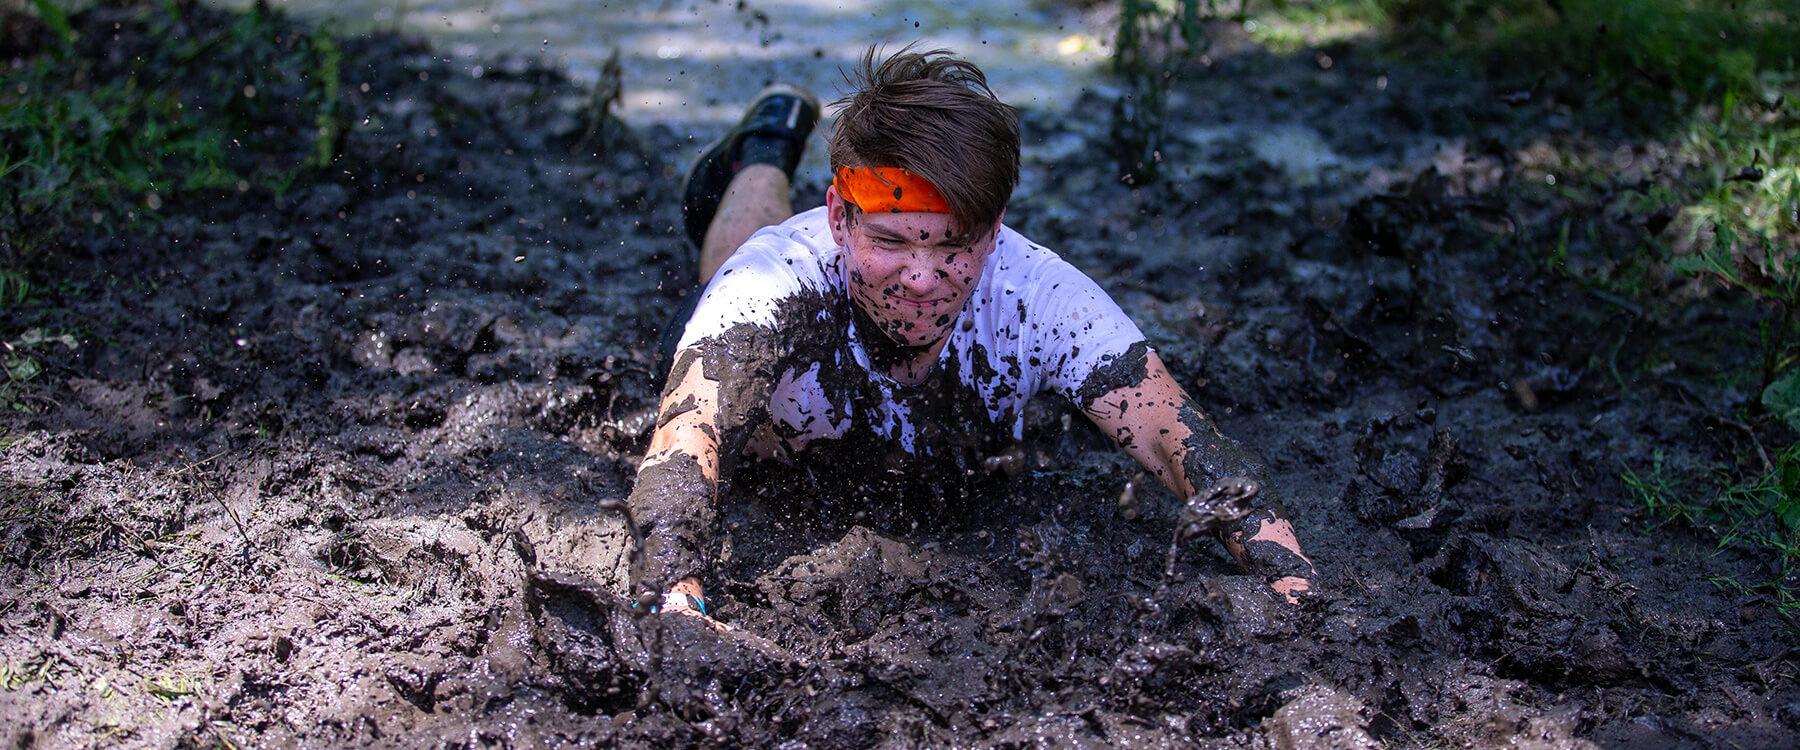 Mud Pit